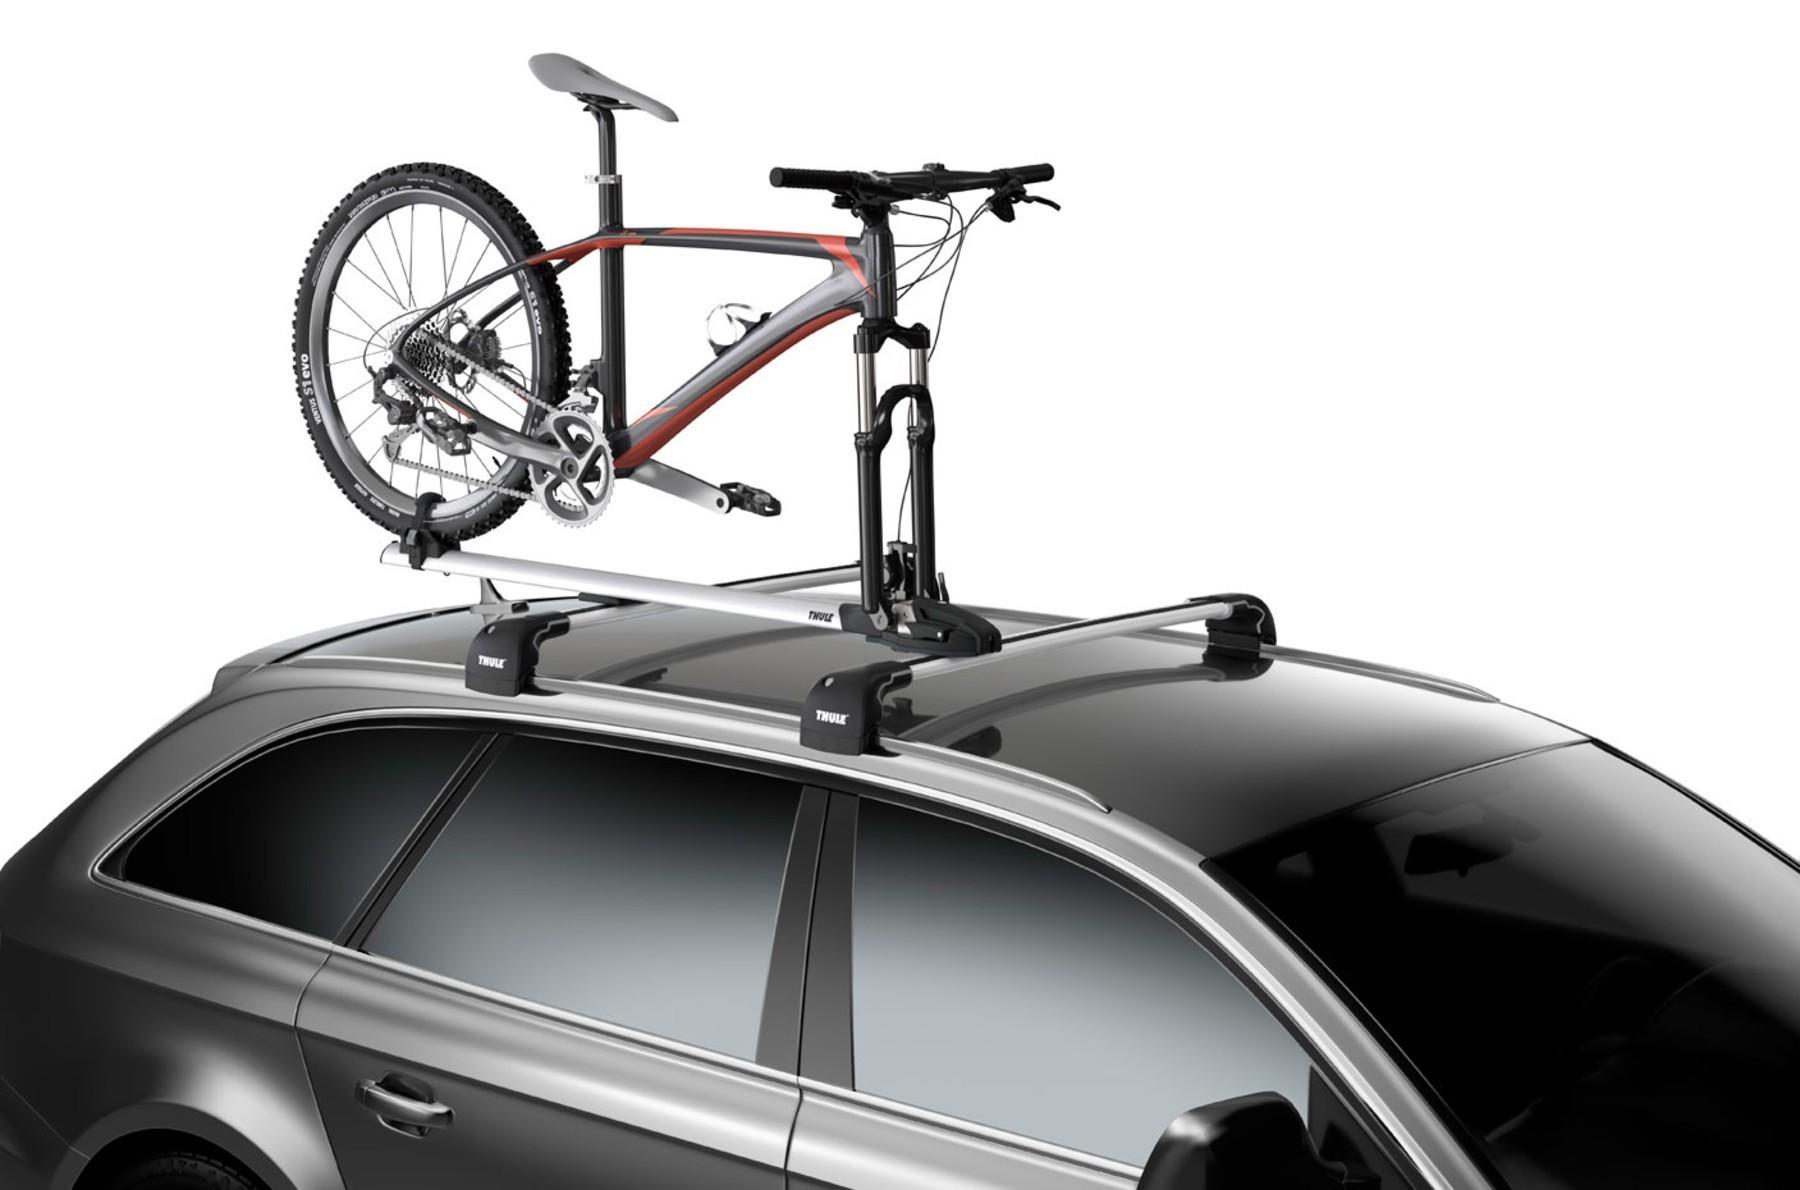 Suporte calha  p/ 1 Bicicleta p/ Teto Thule ThruRide (565)